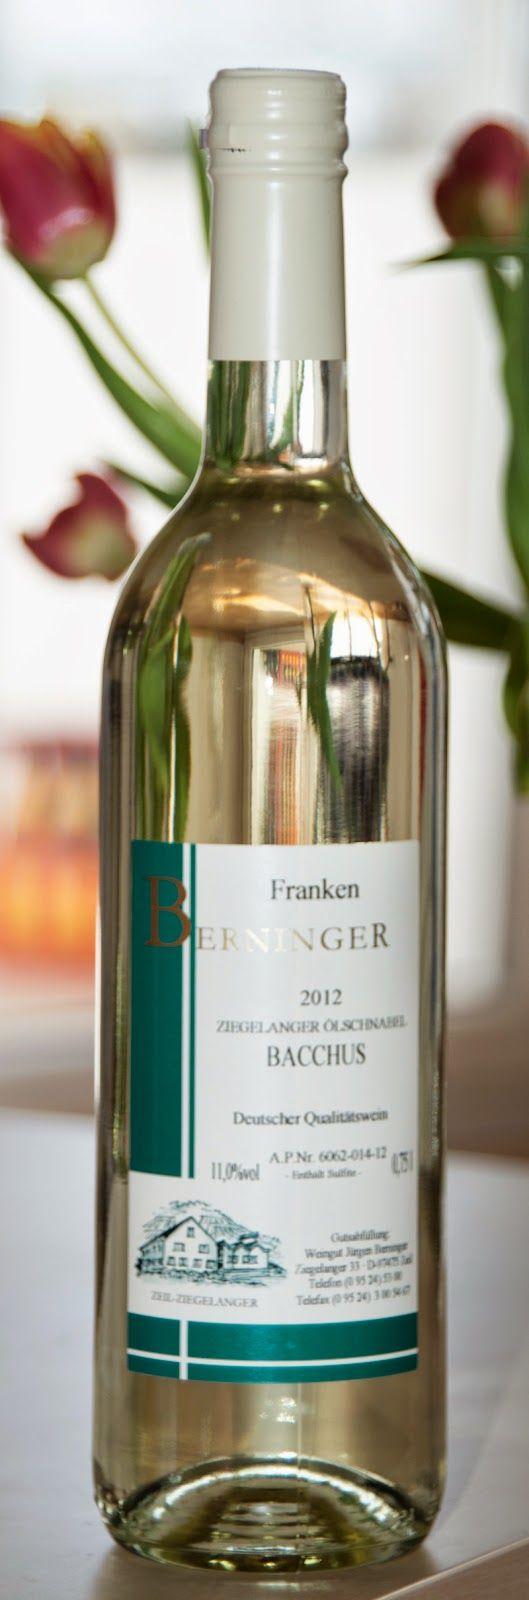 German Bacchus white wine from Berninger in Franconia